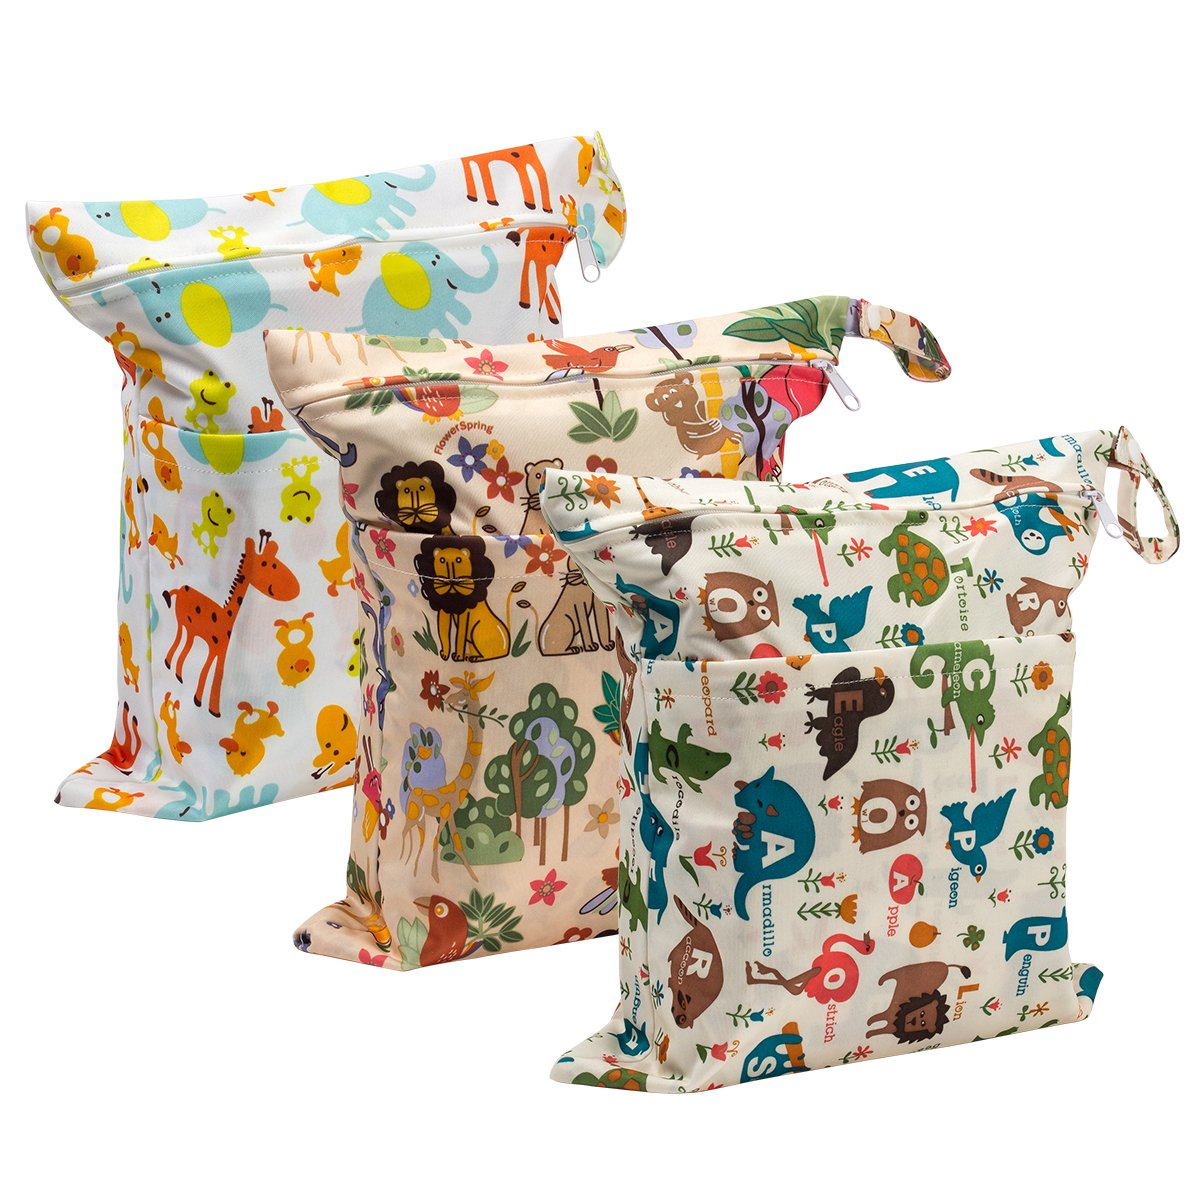 Biubee 3 Pack Wet Dry Cloth Diaper Bags - Baby Waterproof Washable Reusable Hanging Diaper Organizer